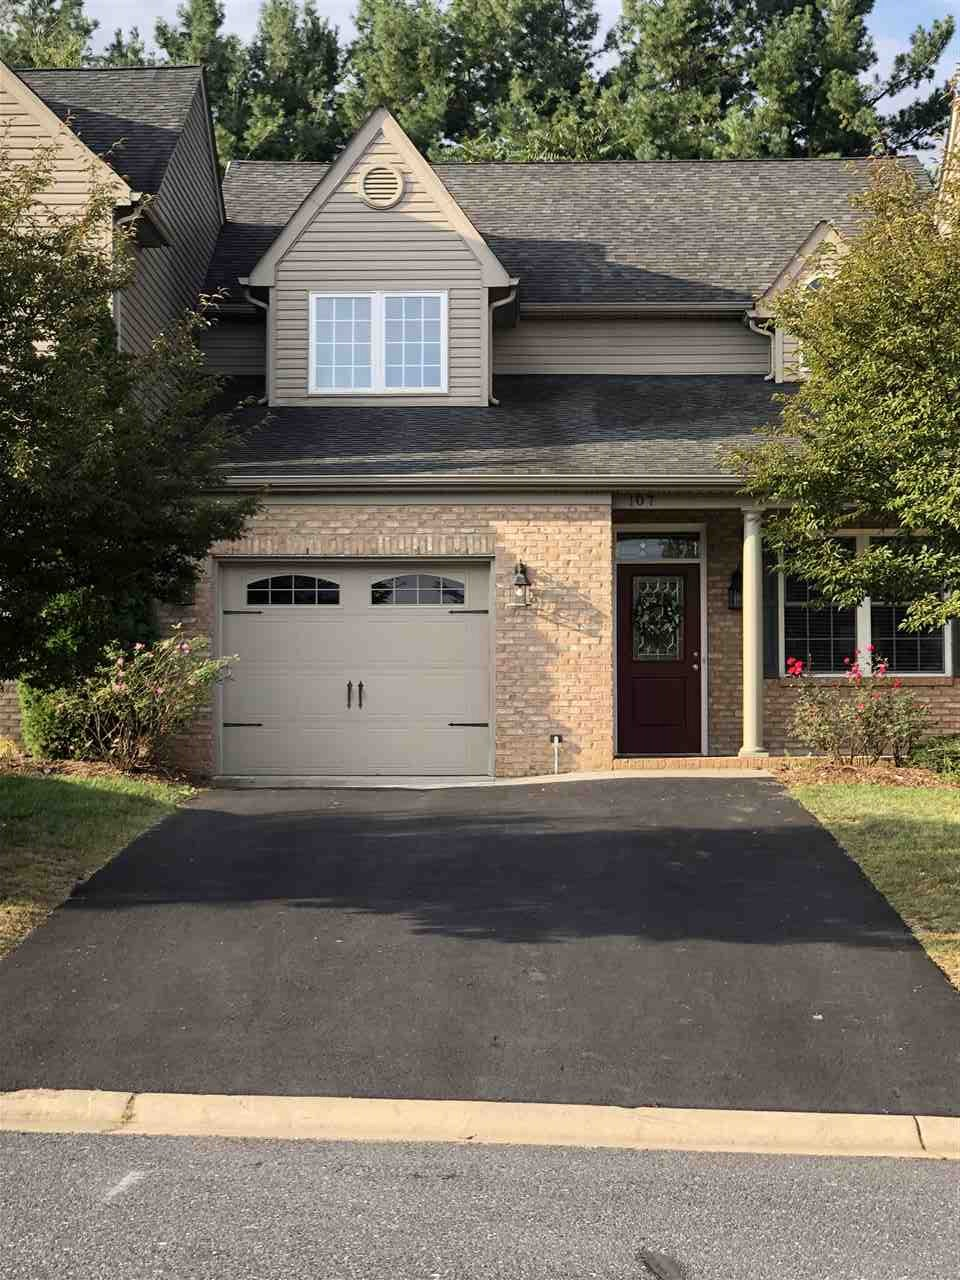 107 Villa View Dr, Staunton, VA, 24401